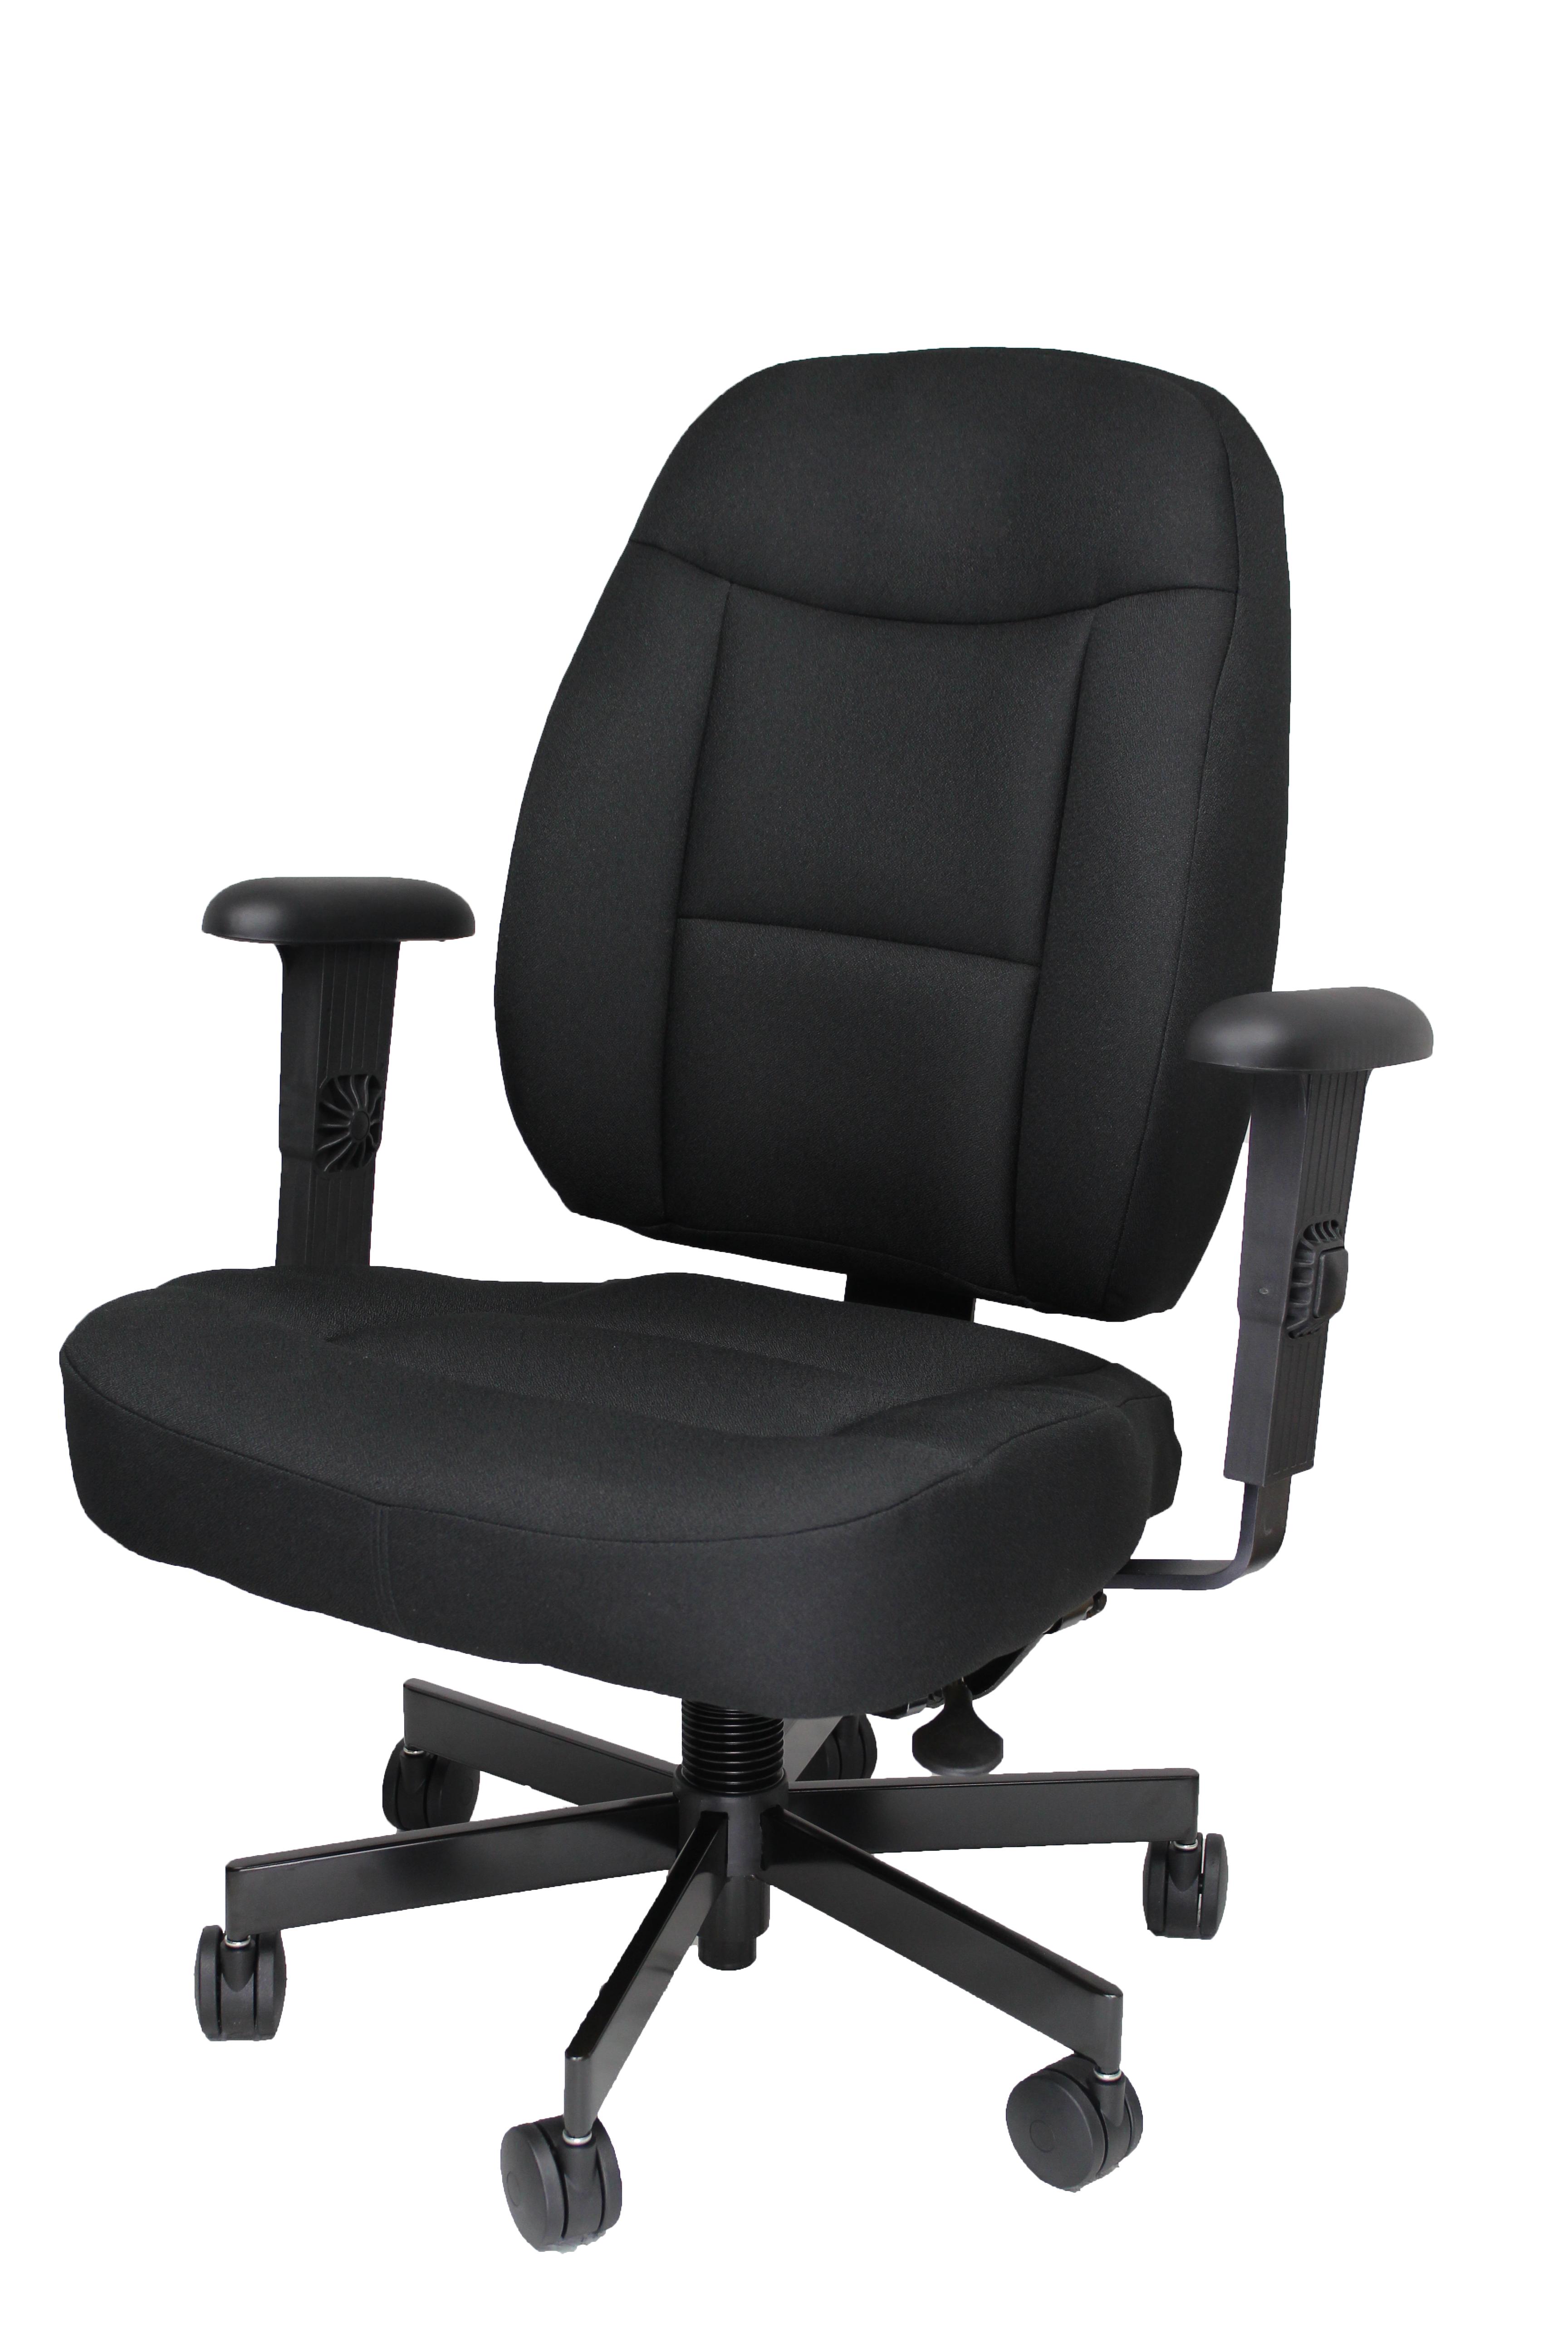 Iron Horse 5000 Black Cloth QTR Front Left No Headrest